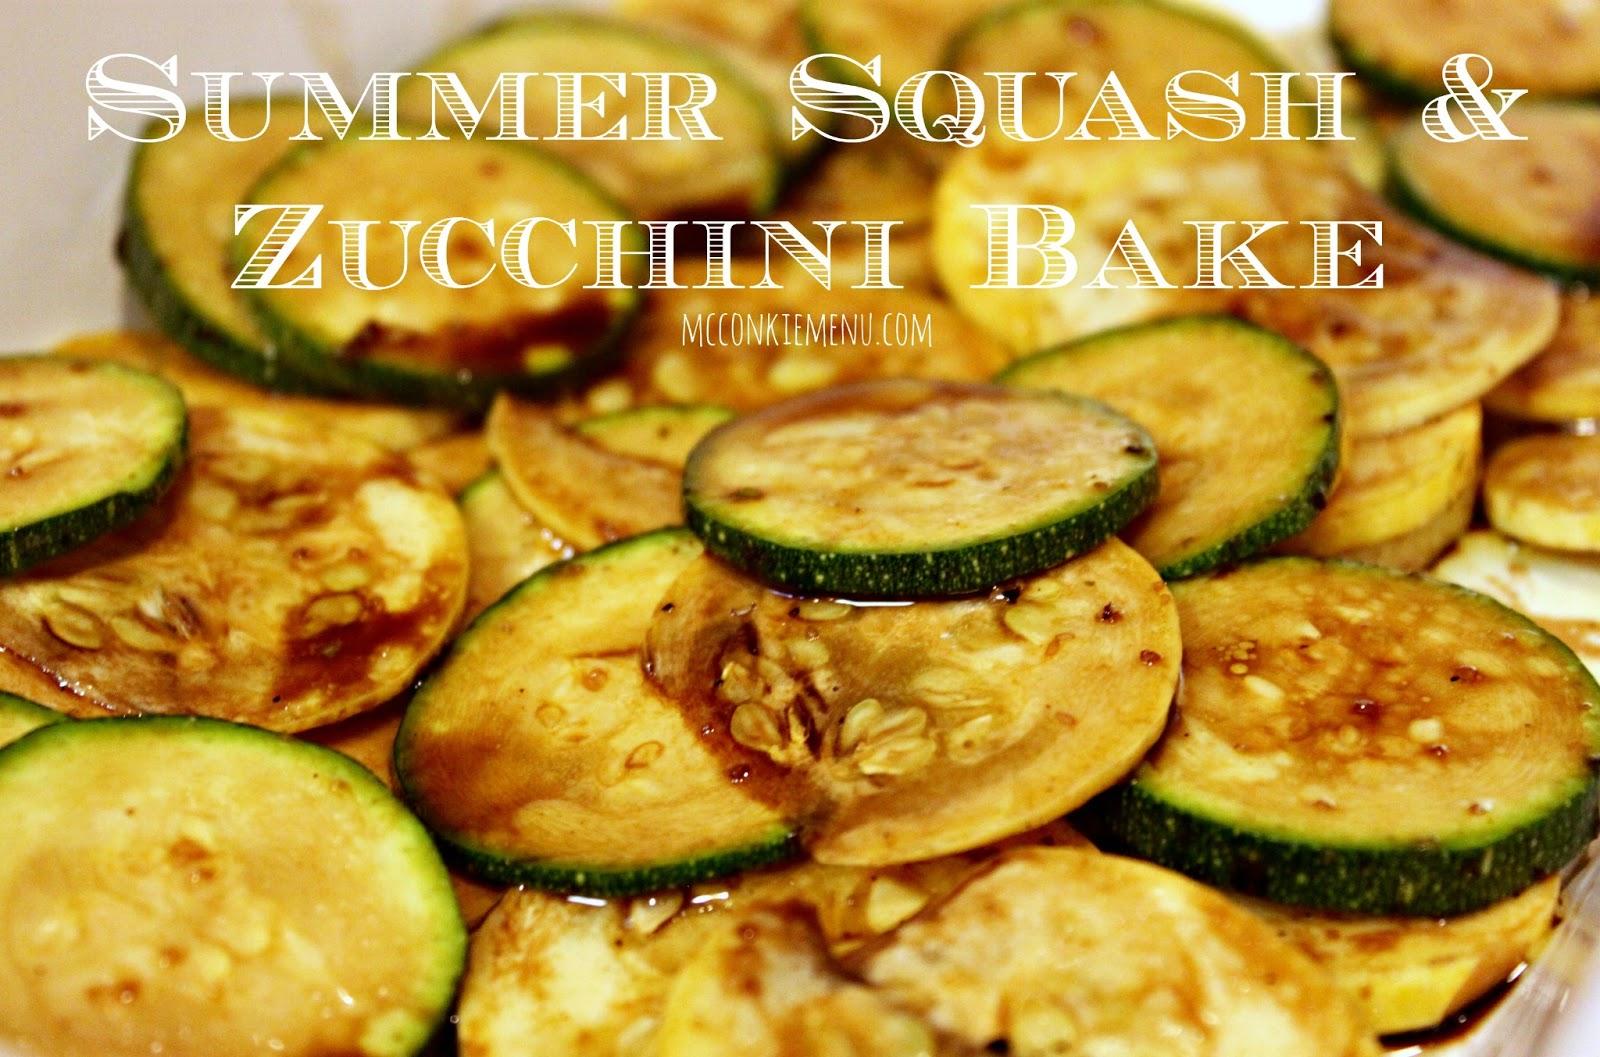 McConkie Menu: Summer Squash and Zucchini Bake